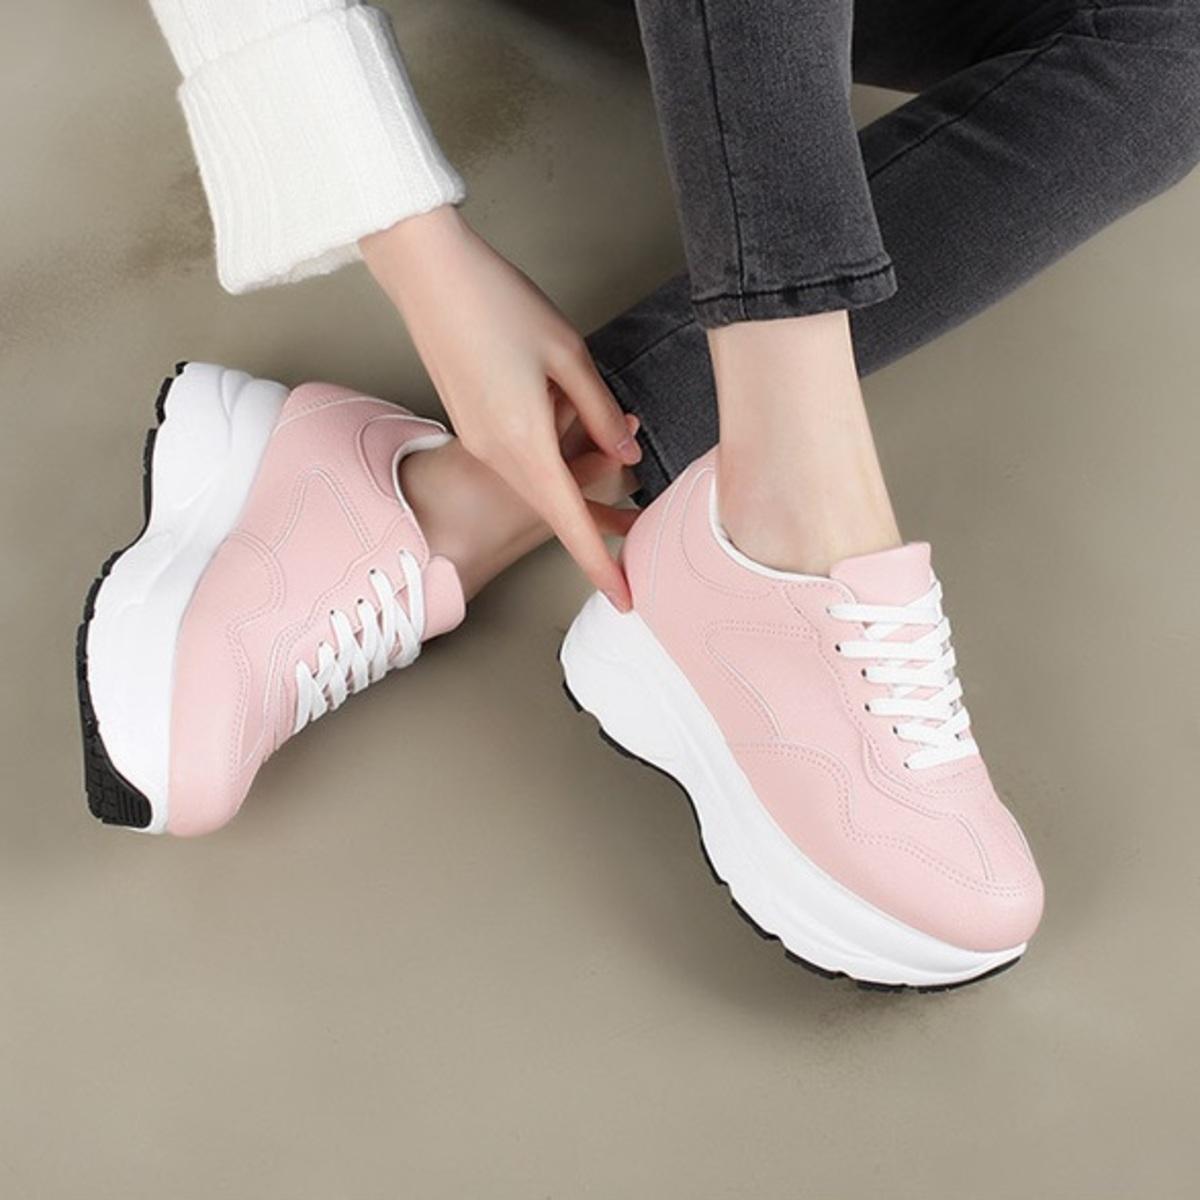 KR-Block Heel Sneakers